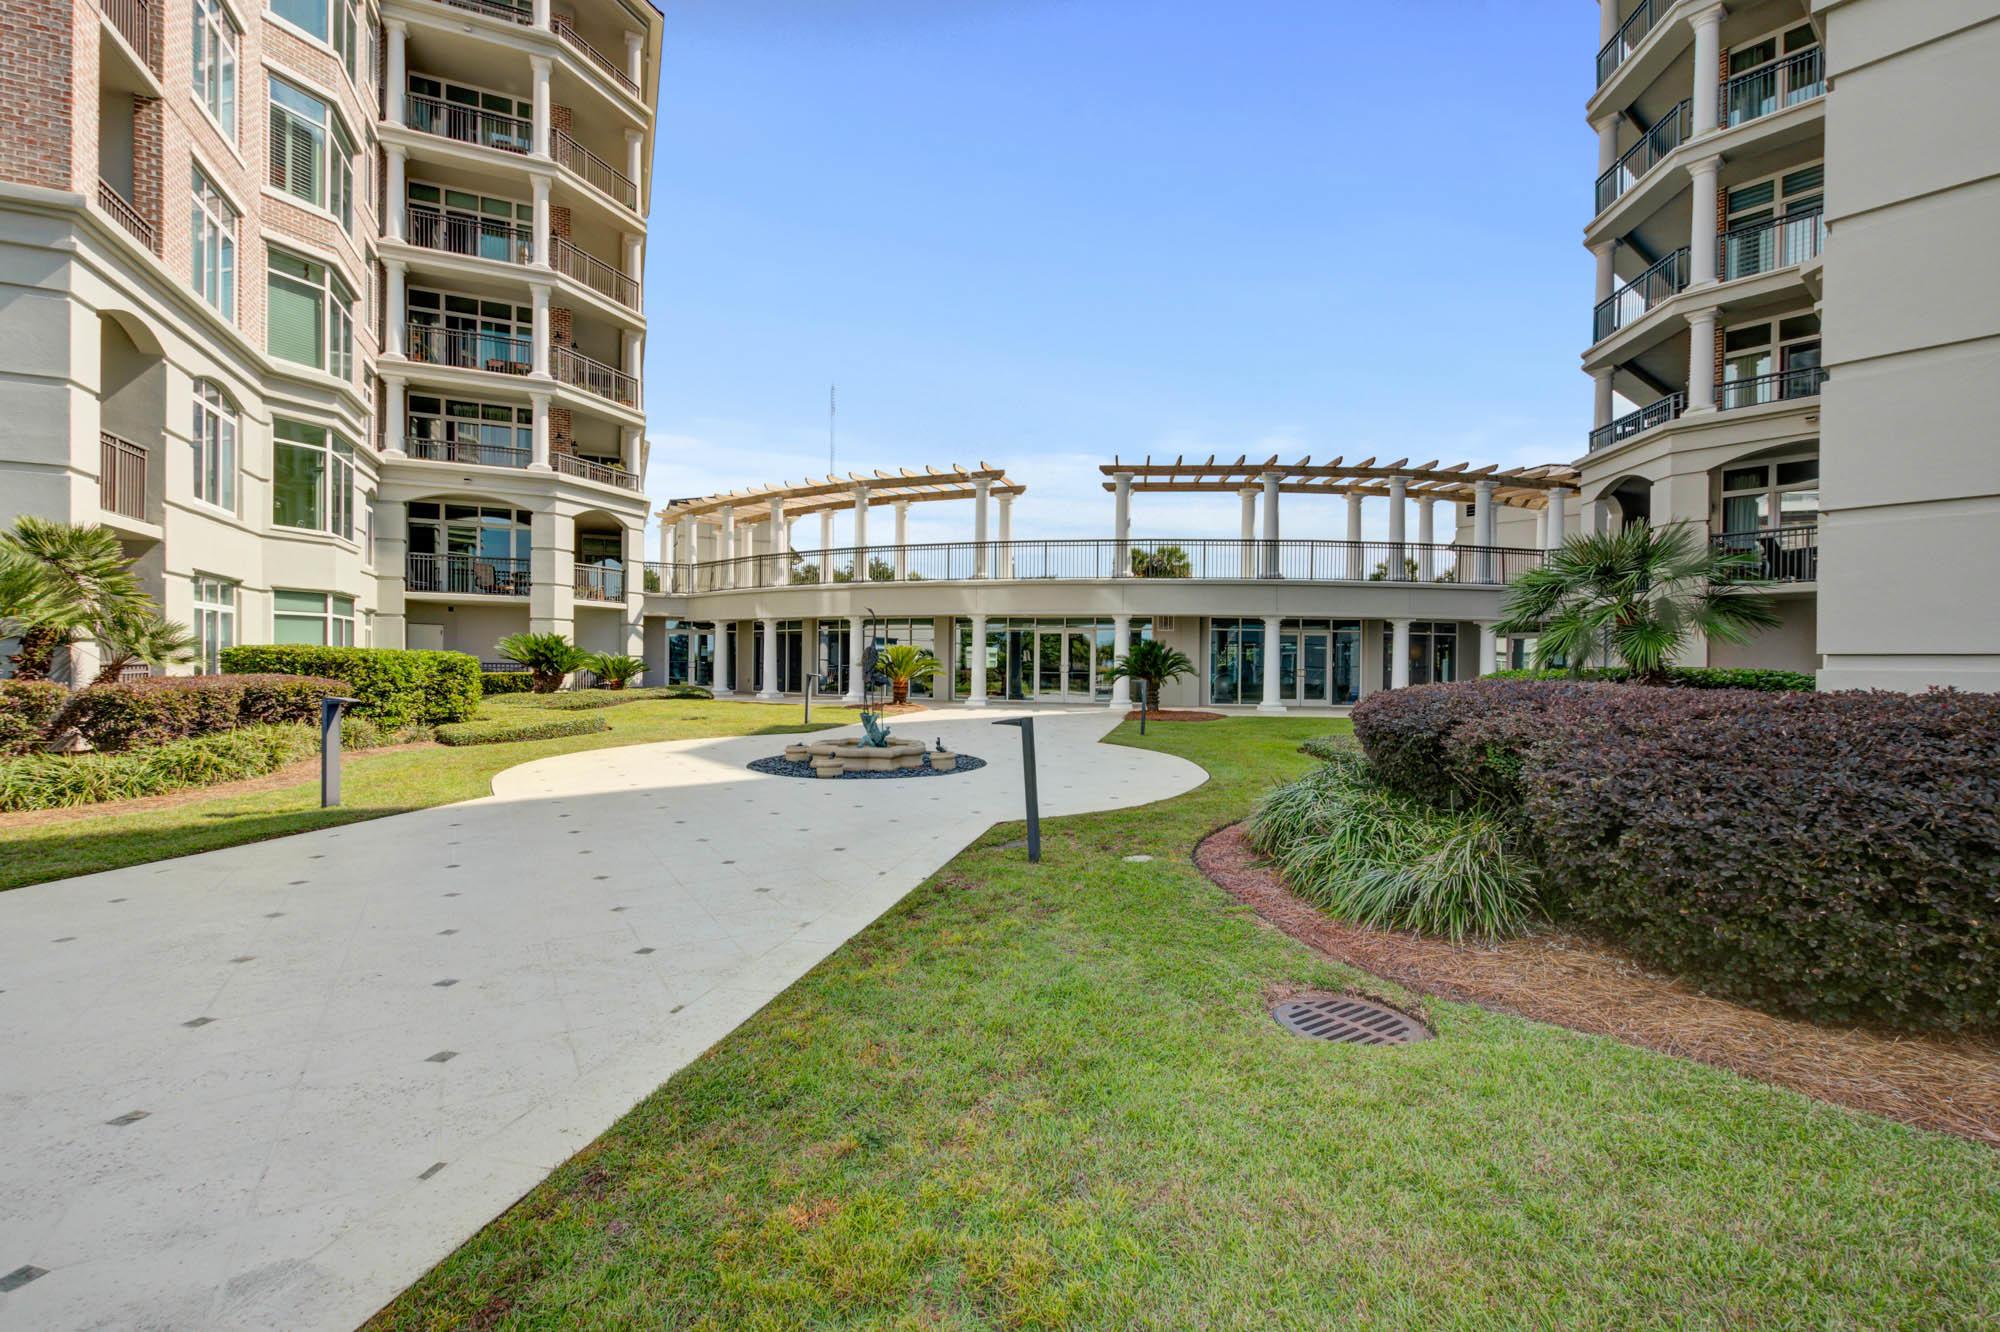 Renaissance On Chas Harbor Homes For Sale - 125 Plaza, Mount Pleasant, SC - 15